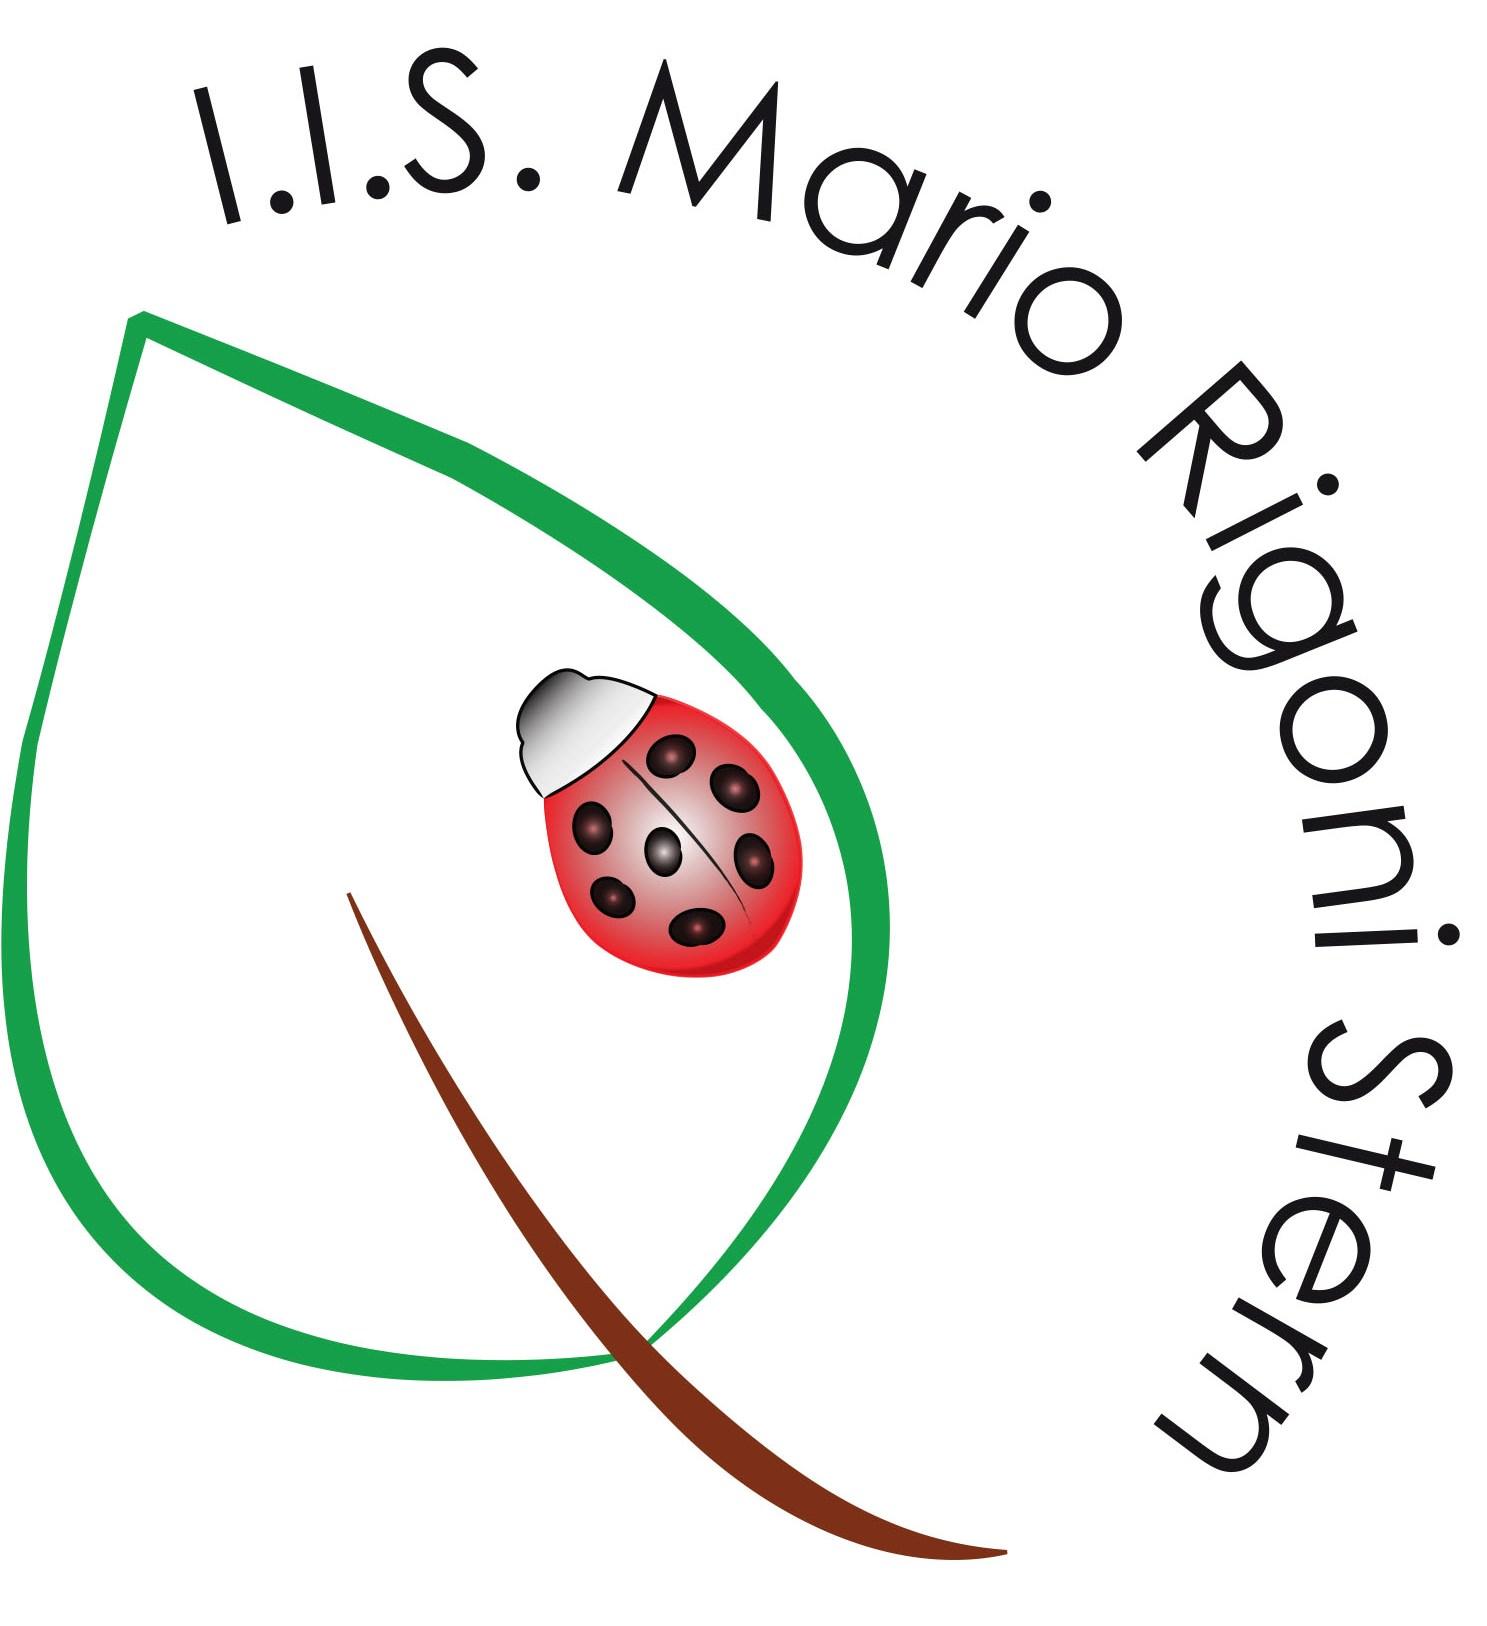 Logo-IIS-Mario-Rigoni-Stern-1